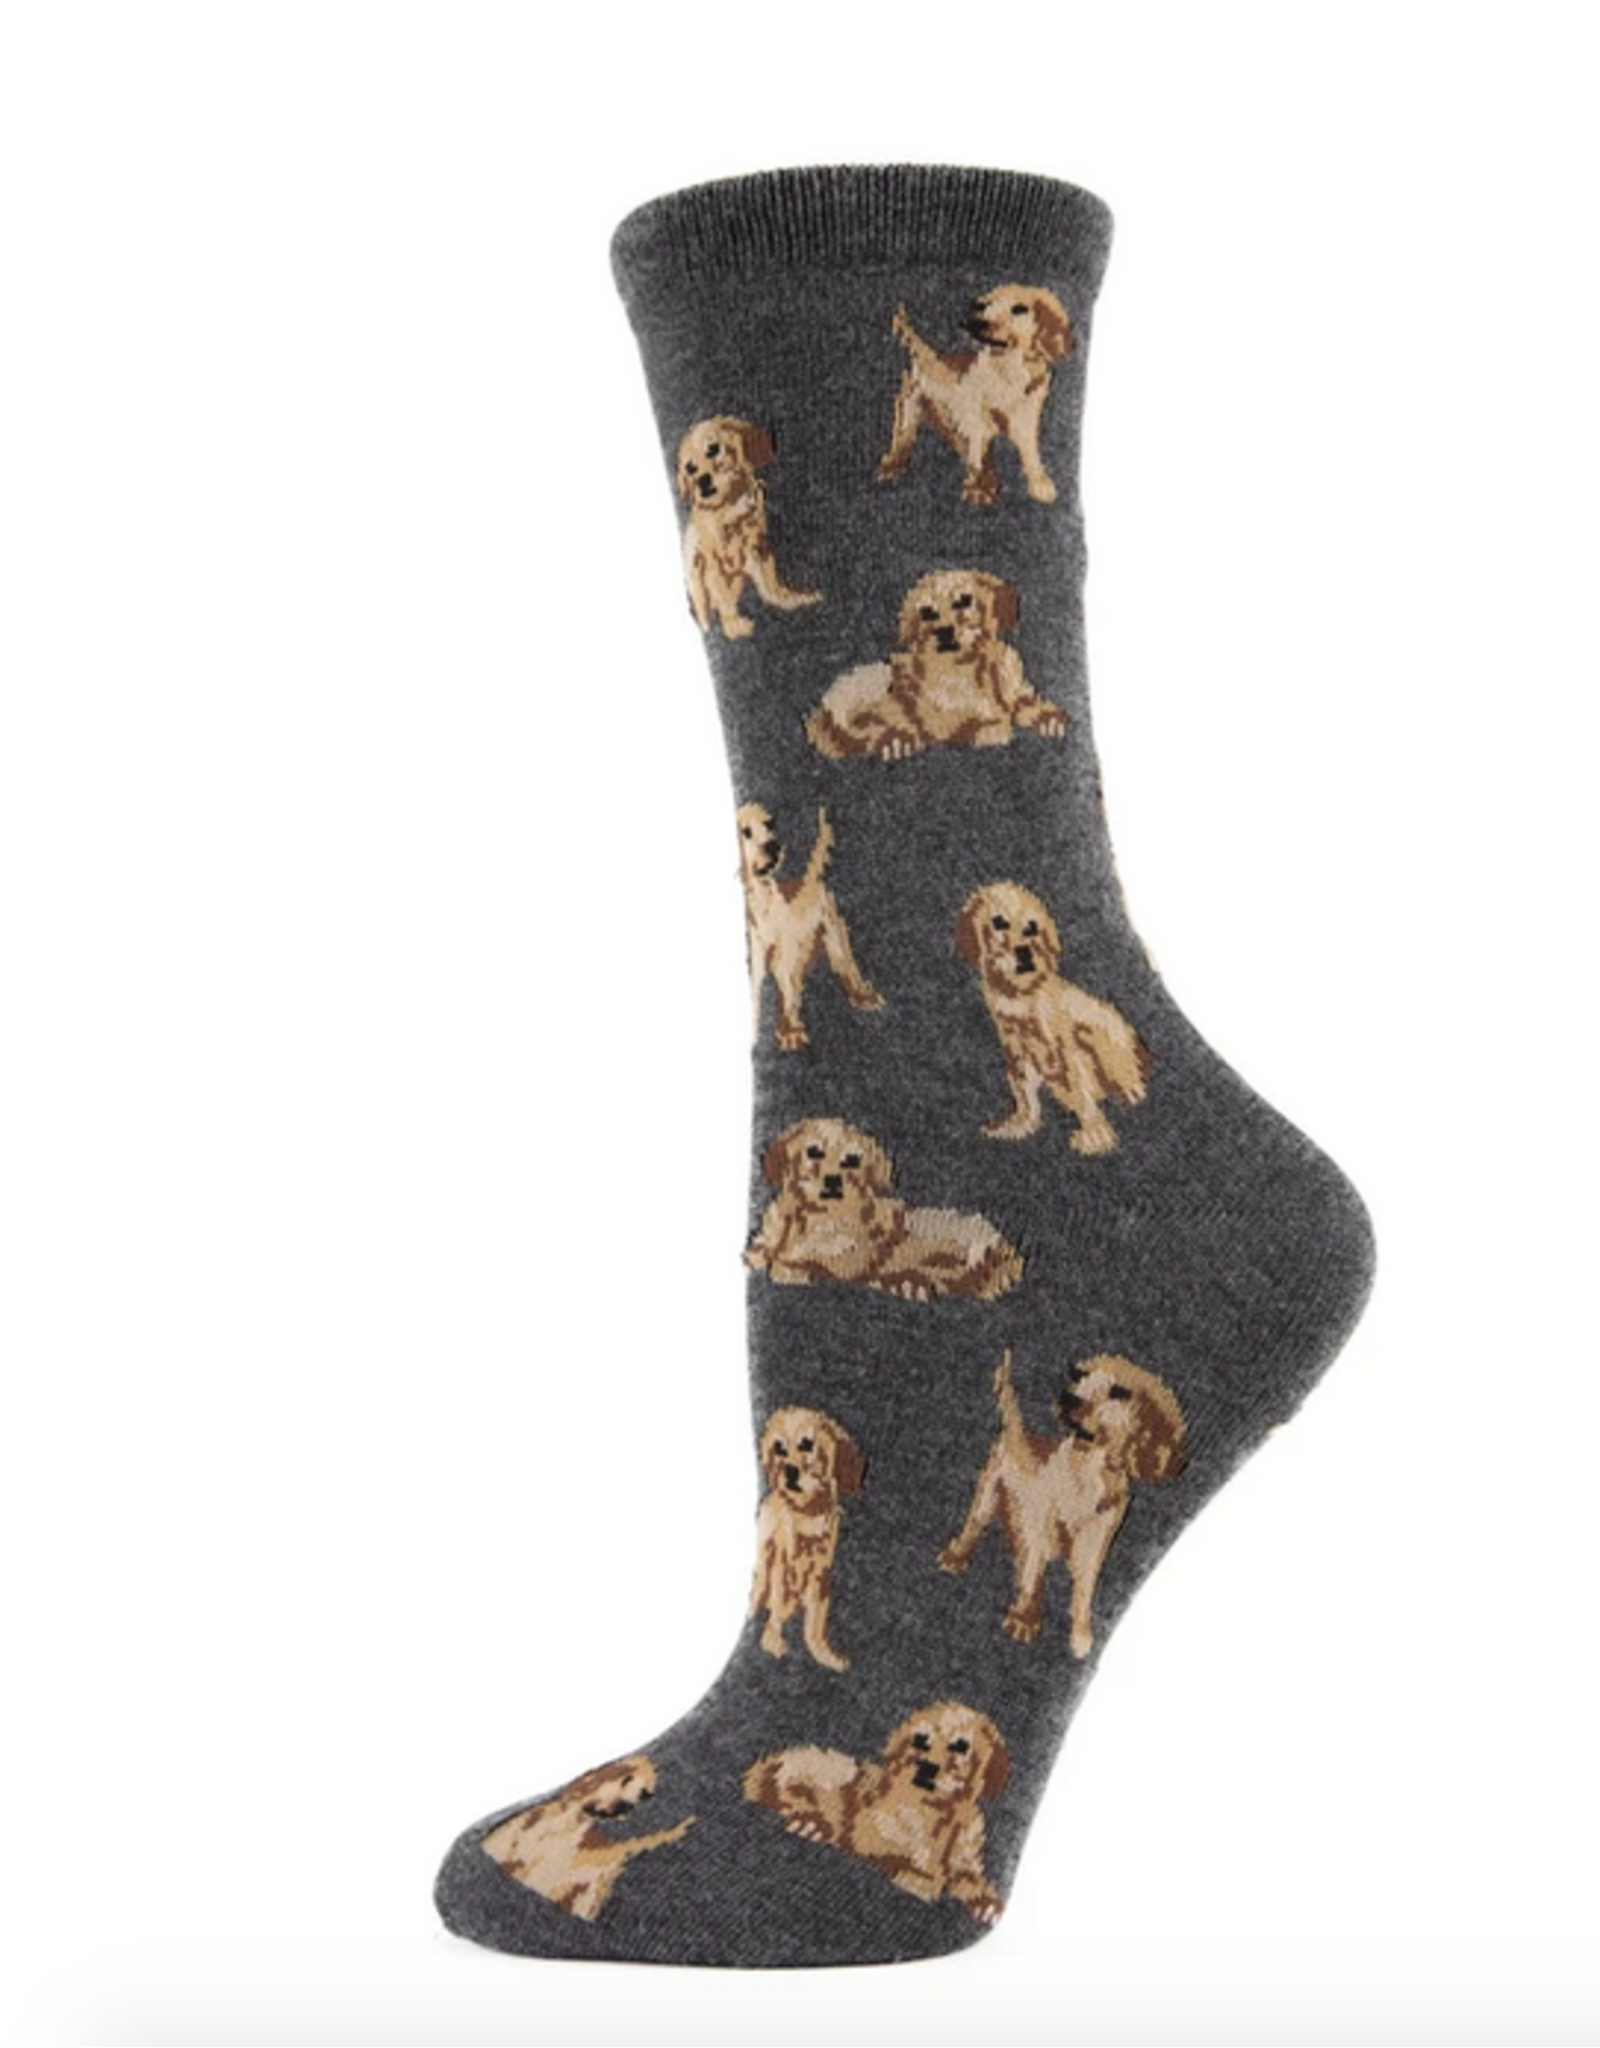 Crew Socks, Golden Retriever, charcoal gray